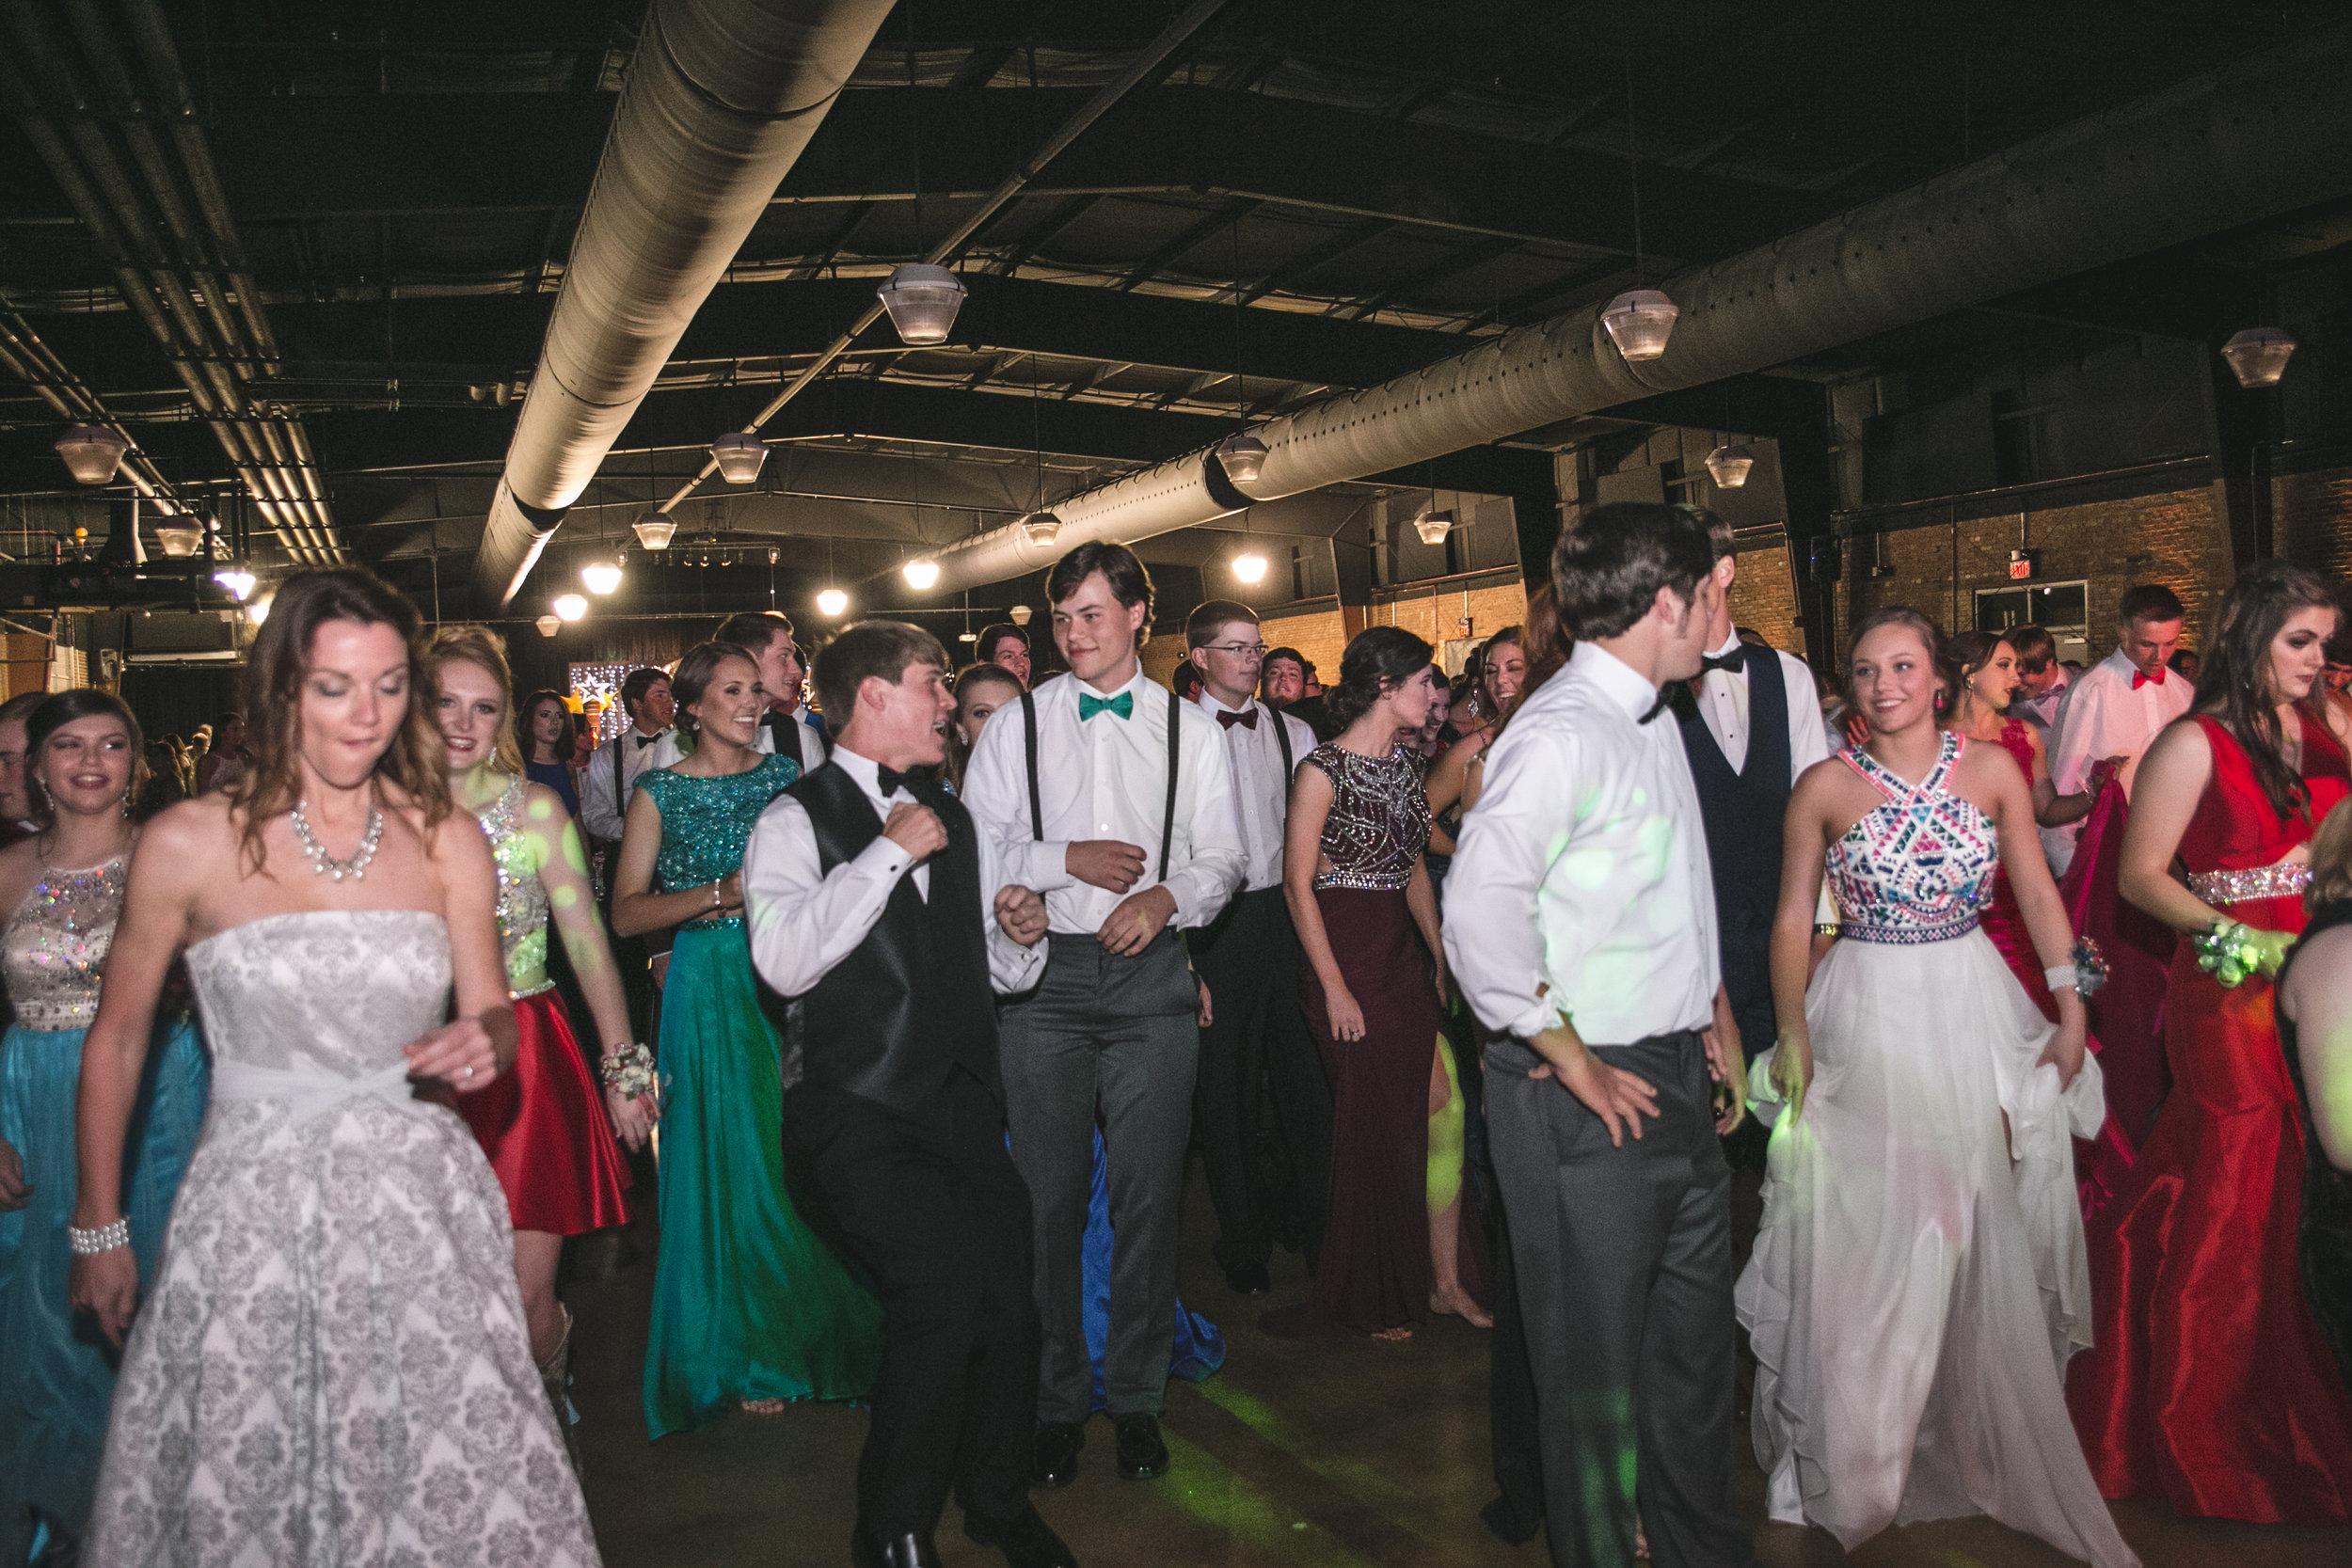 Nashville_Wedding_Photographers_DJ_Lighting_Bowling_Franklin (29 of 137).jpg